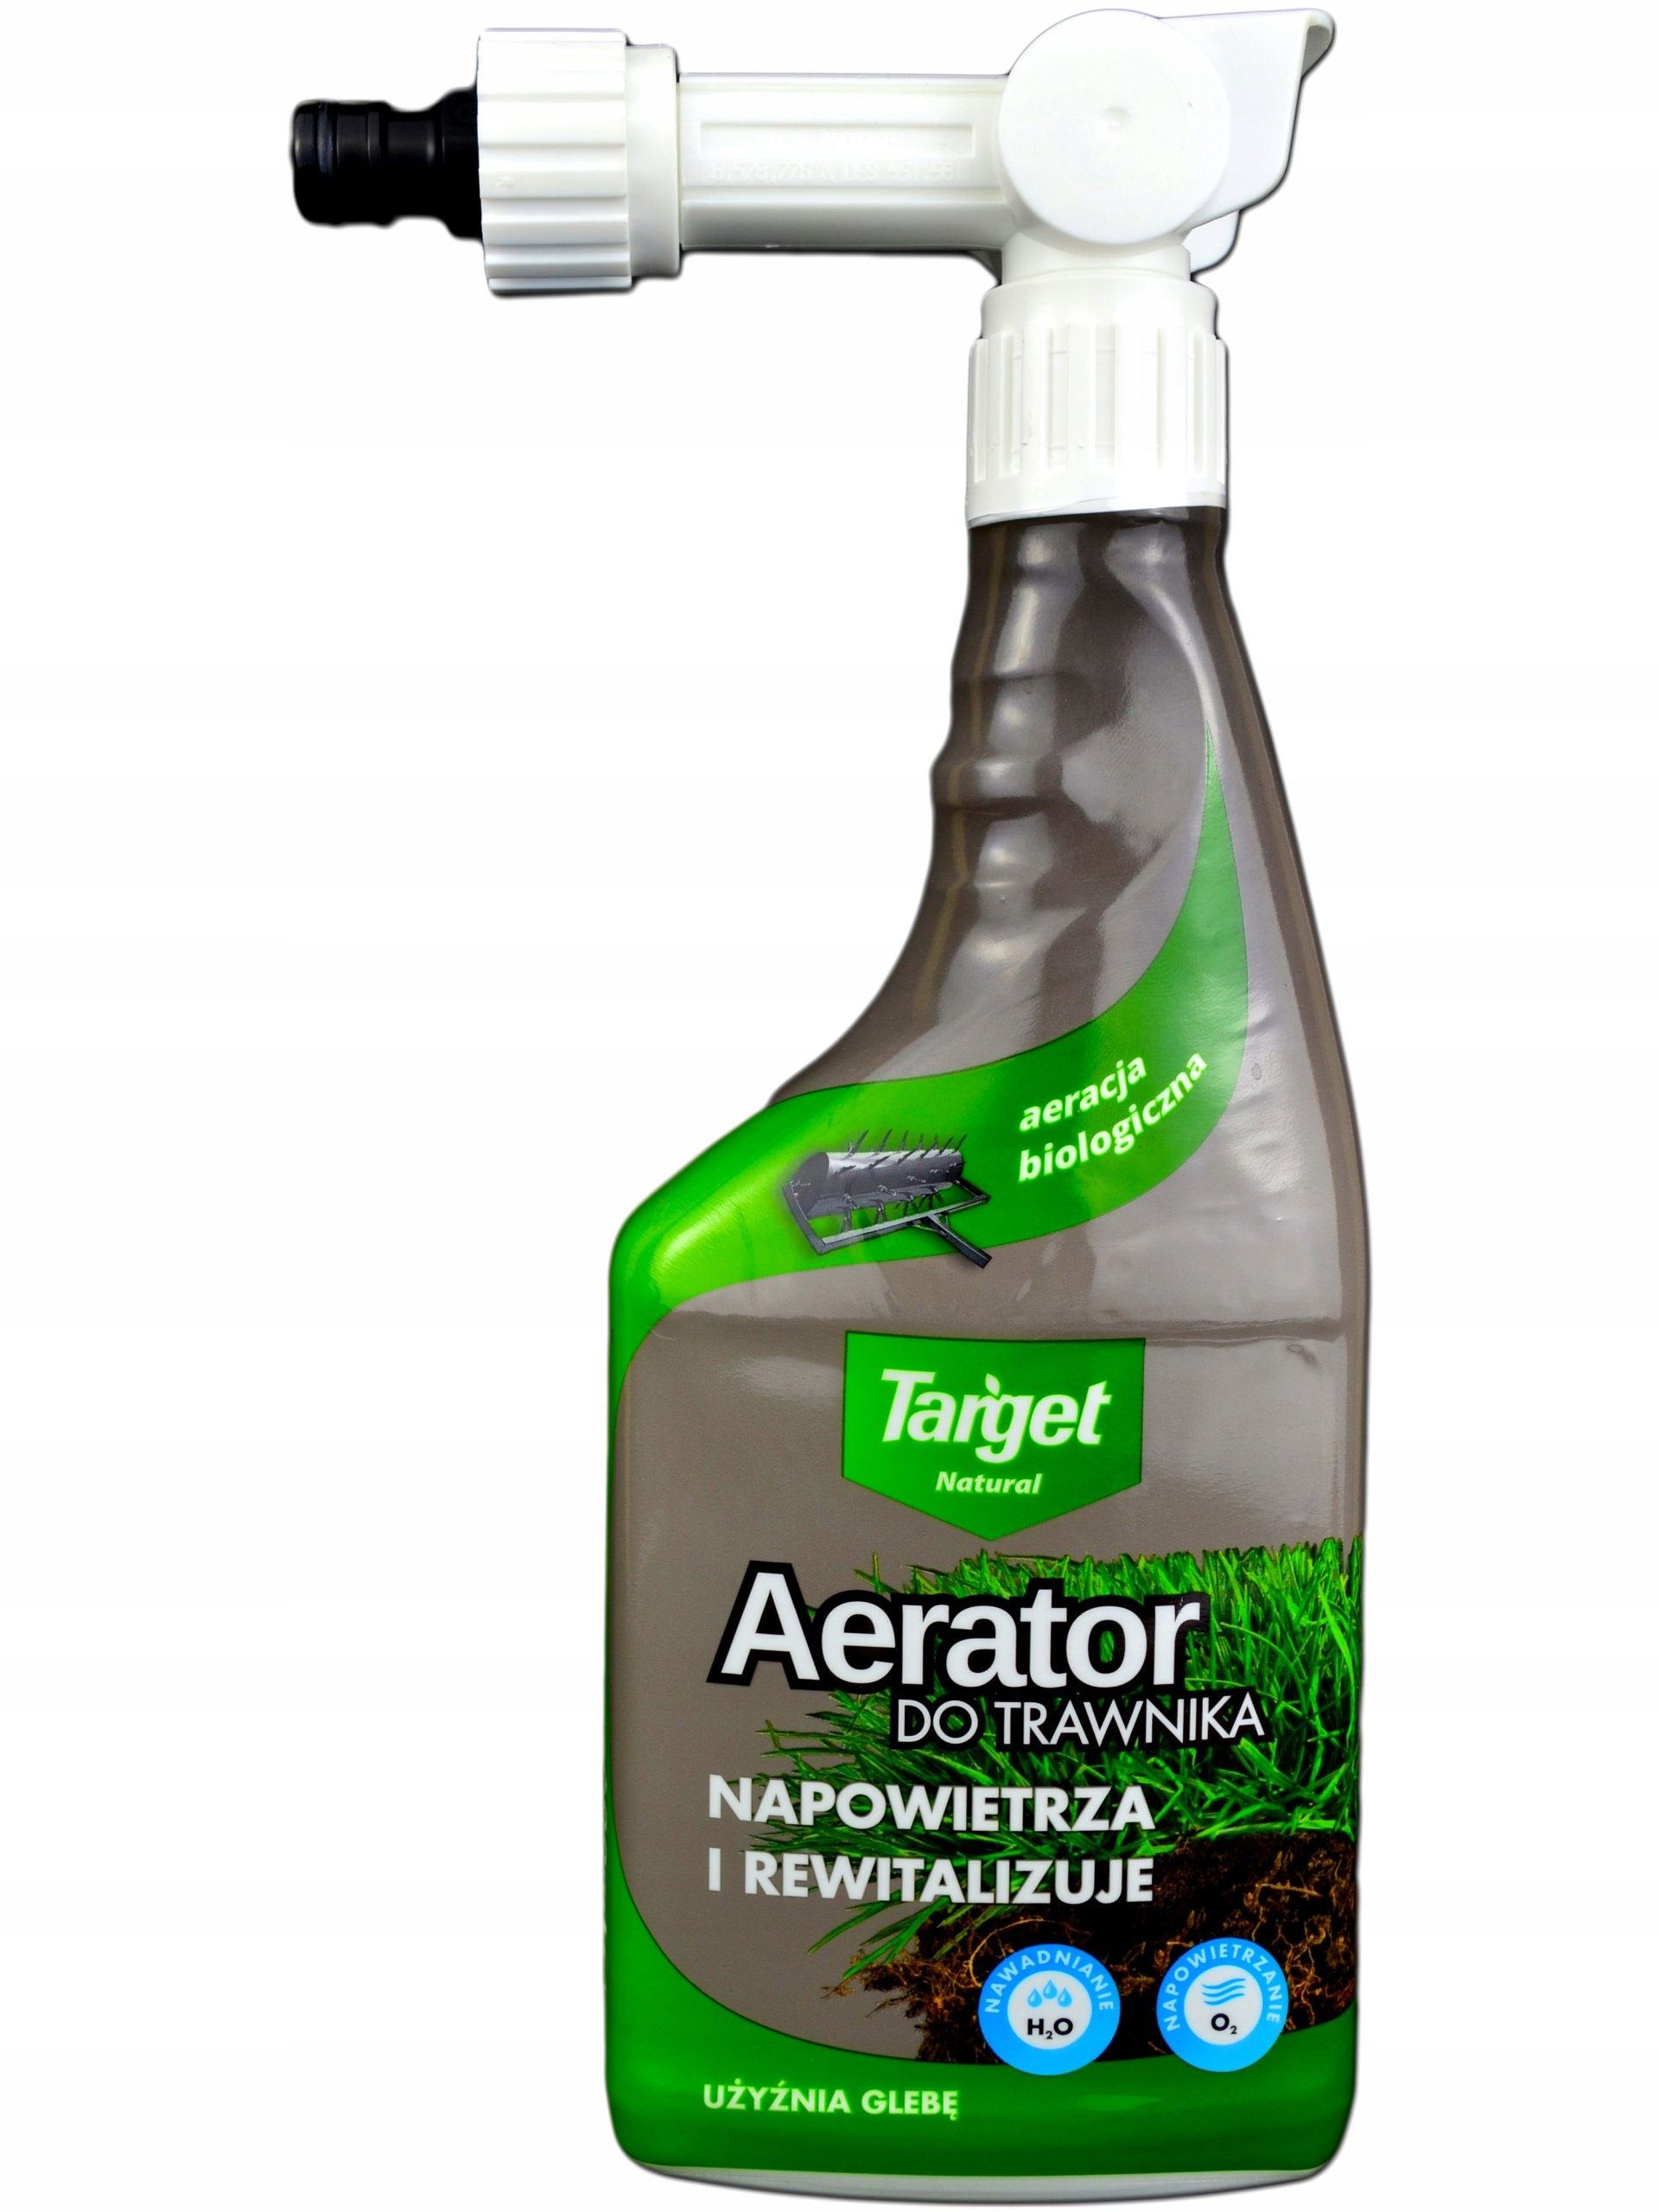 Target Aerator Do Trawnika W Plynie Spray 600ml 6719525173 Allegro Pl